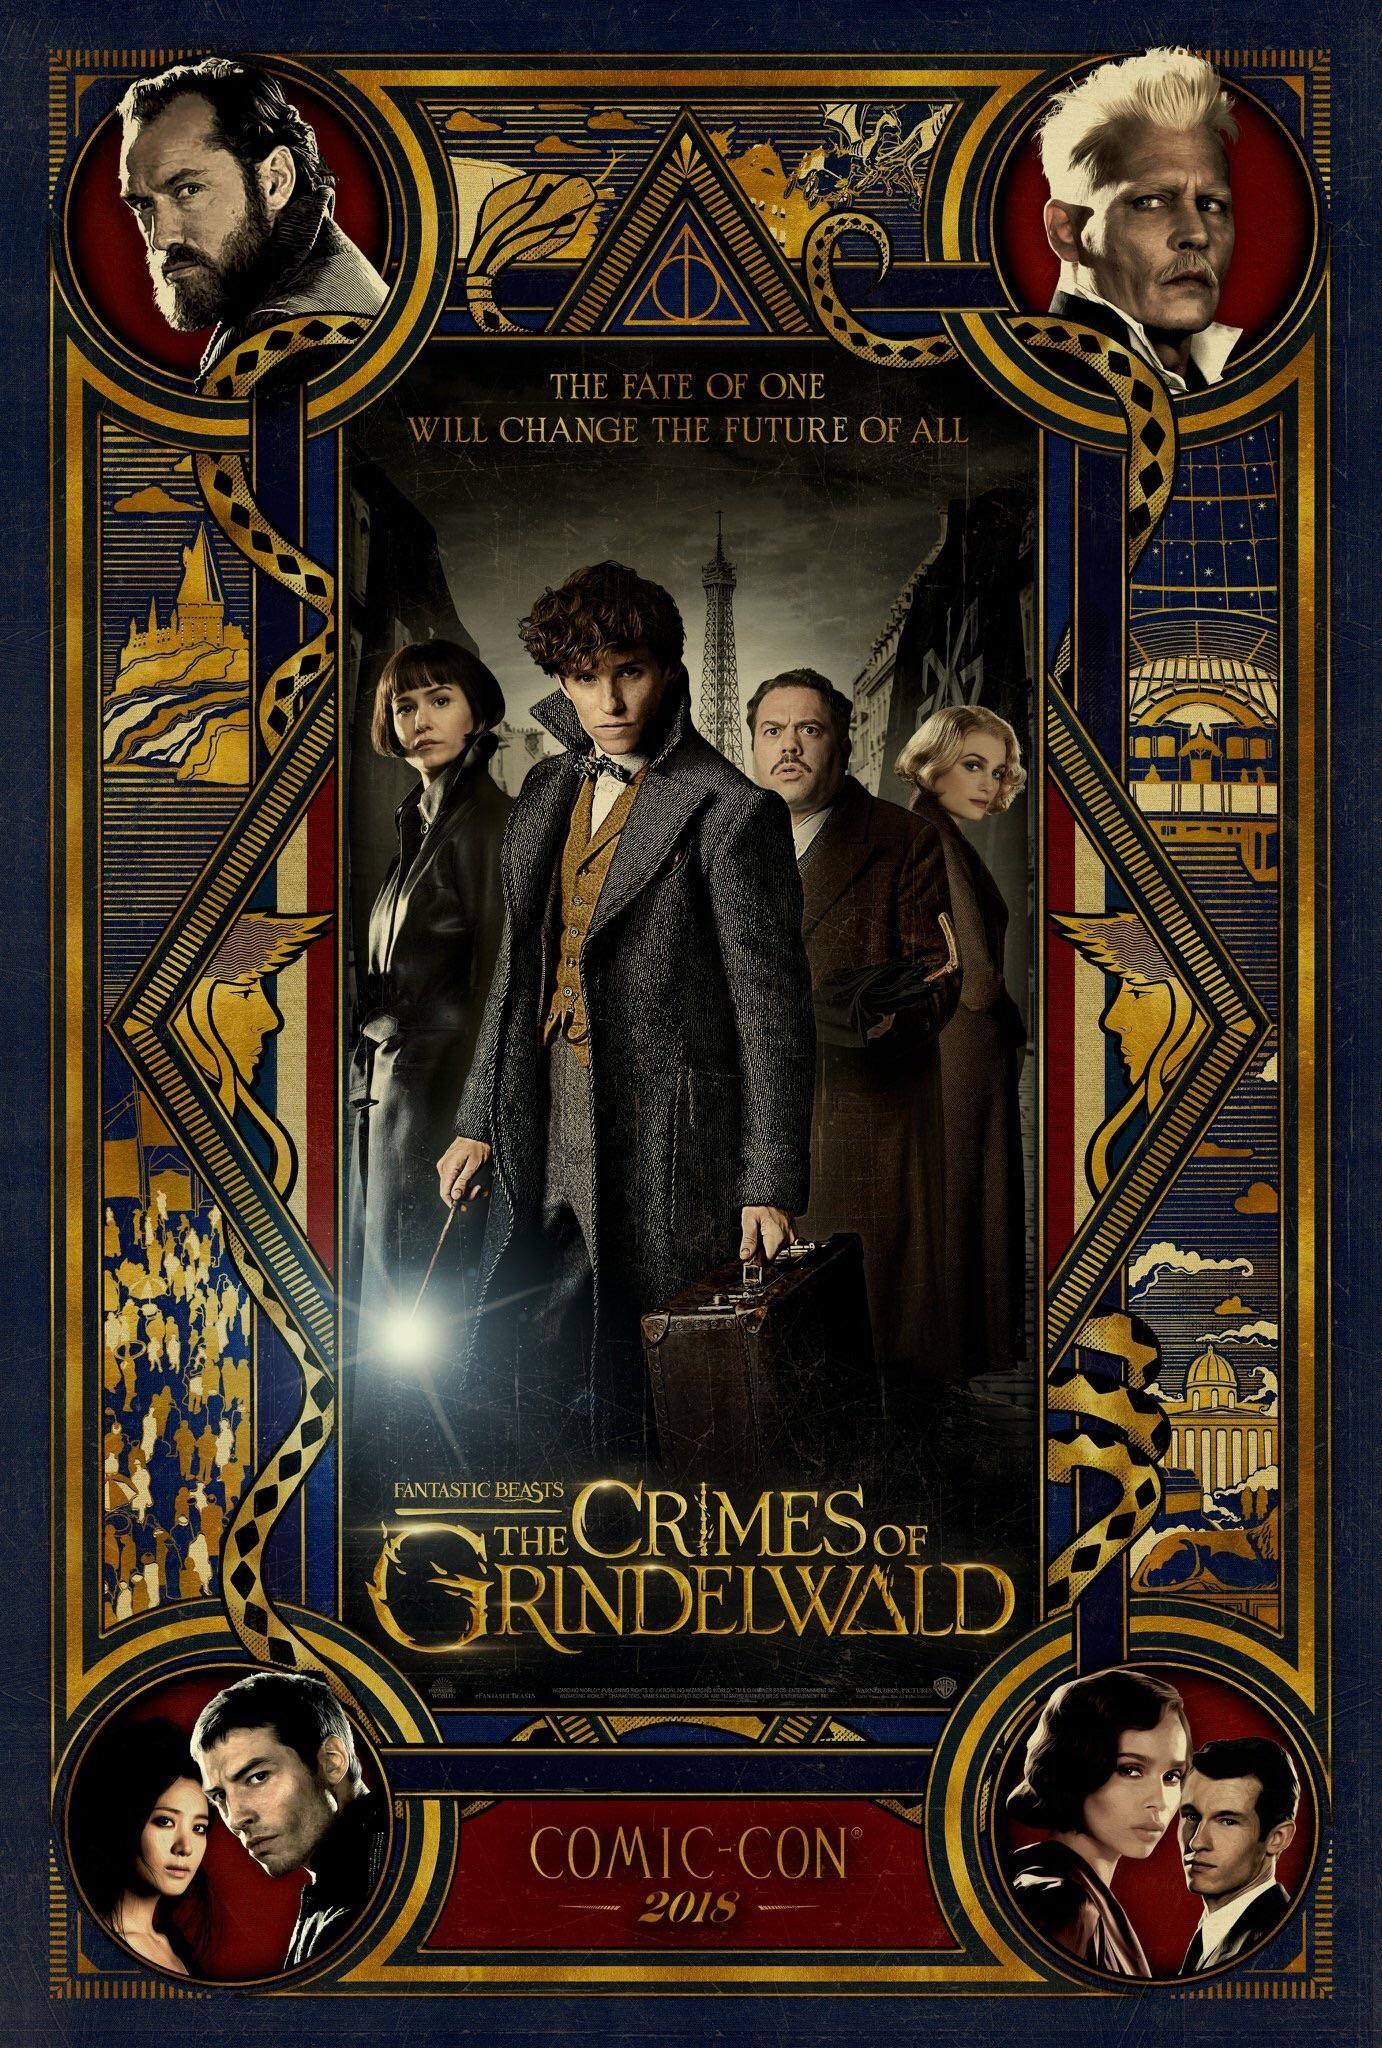 fantastic beasts the crimes of grindelwald watch online free reddit